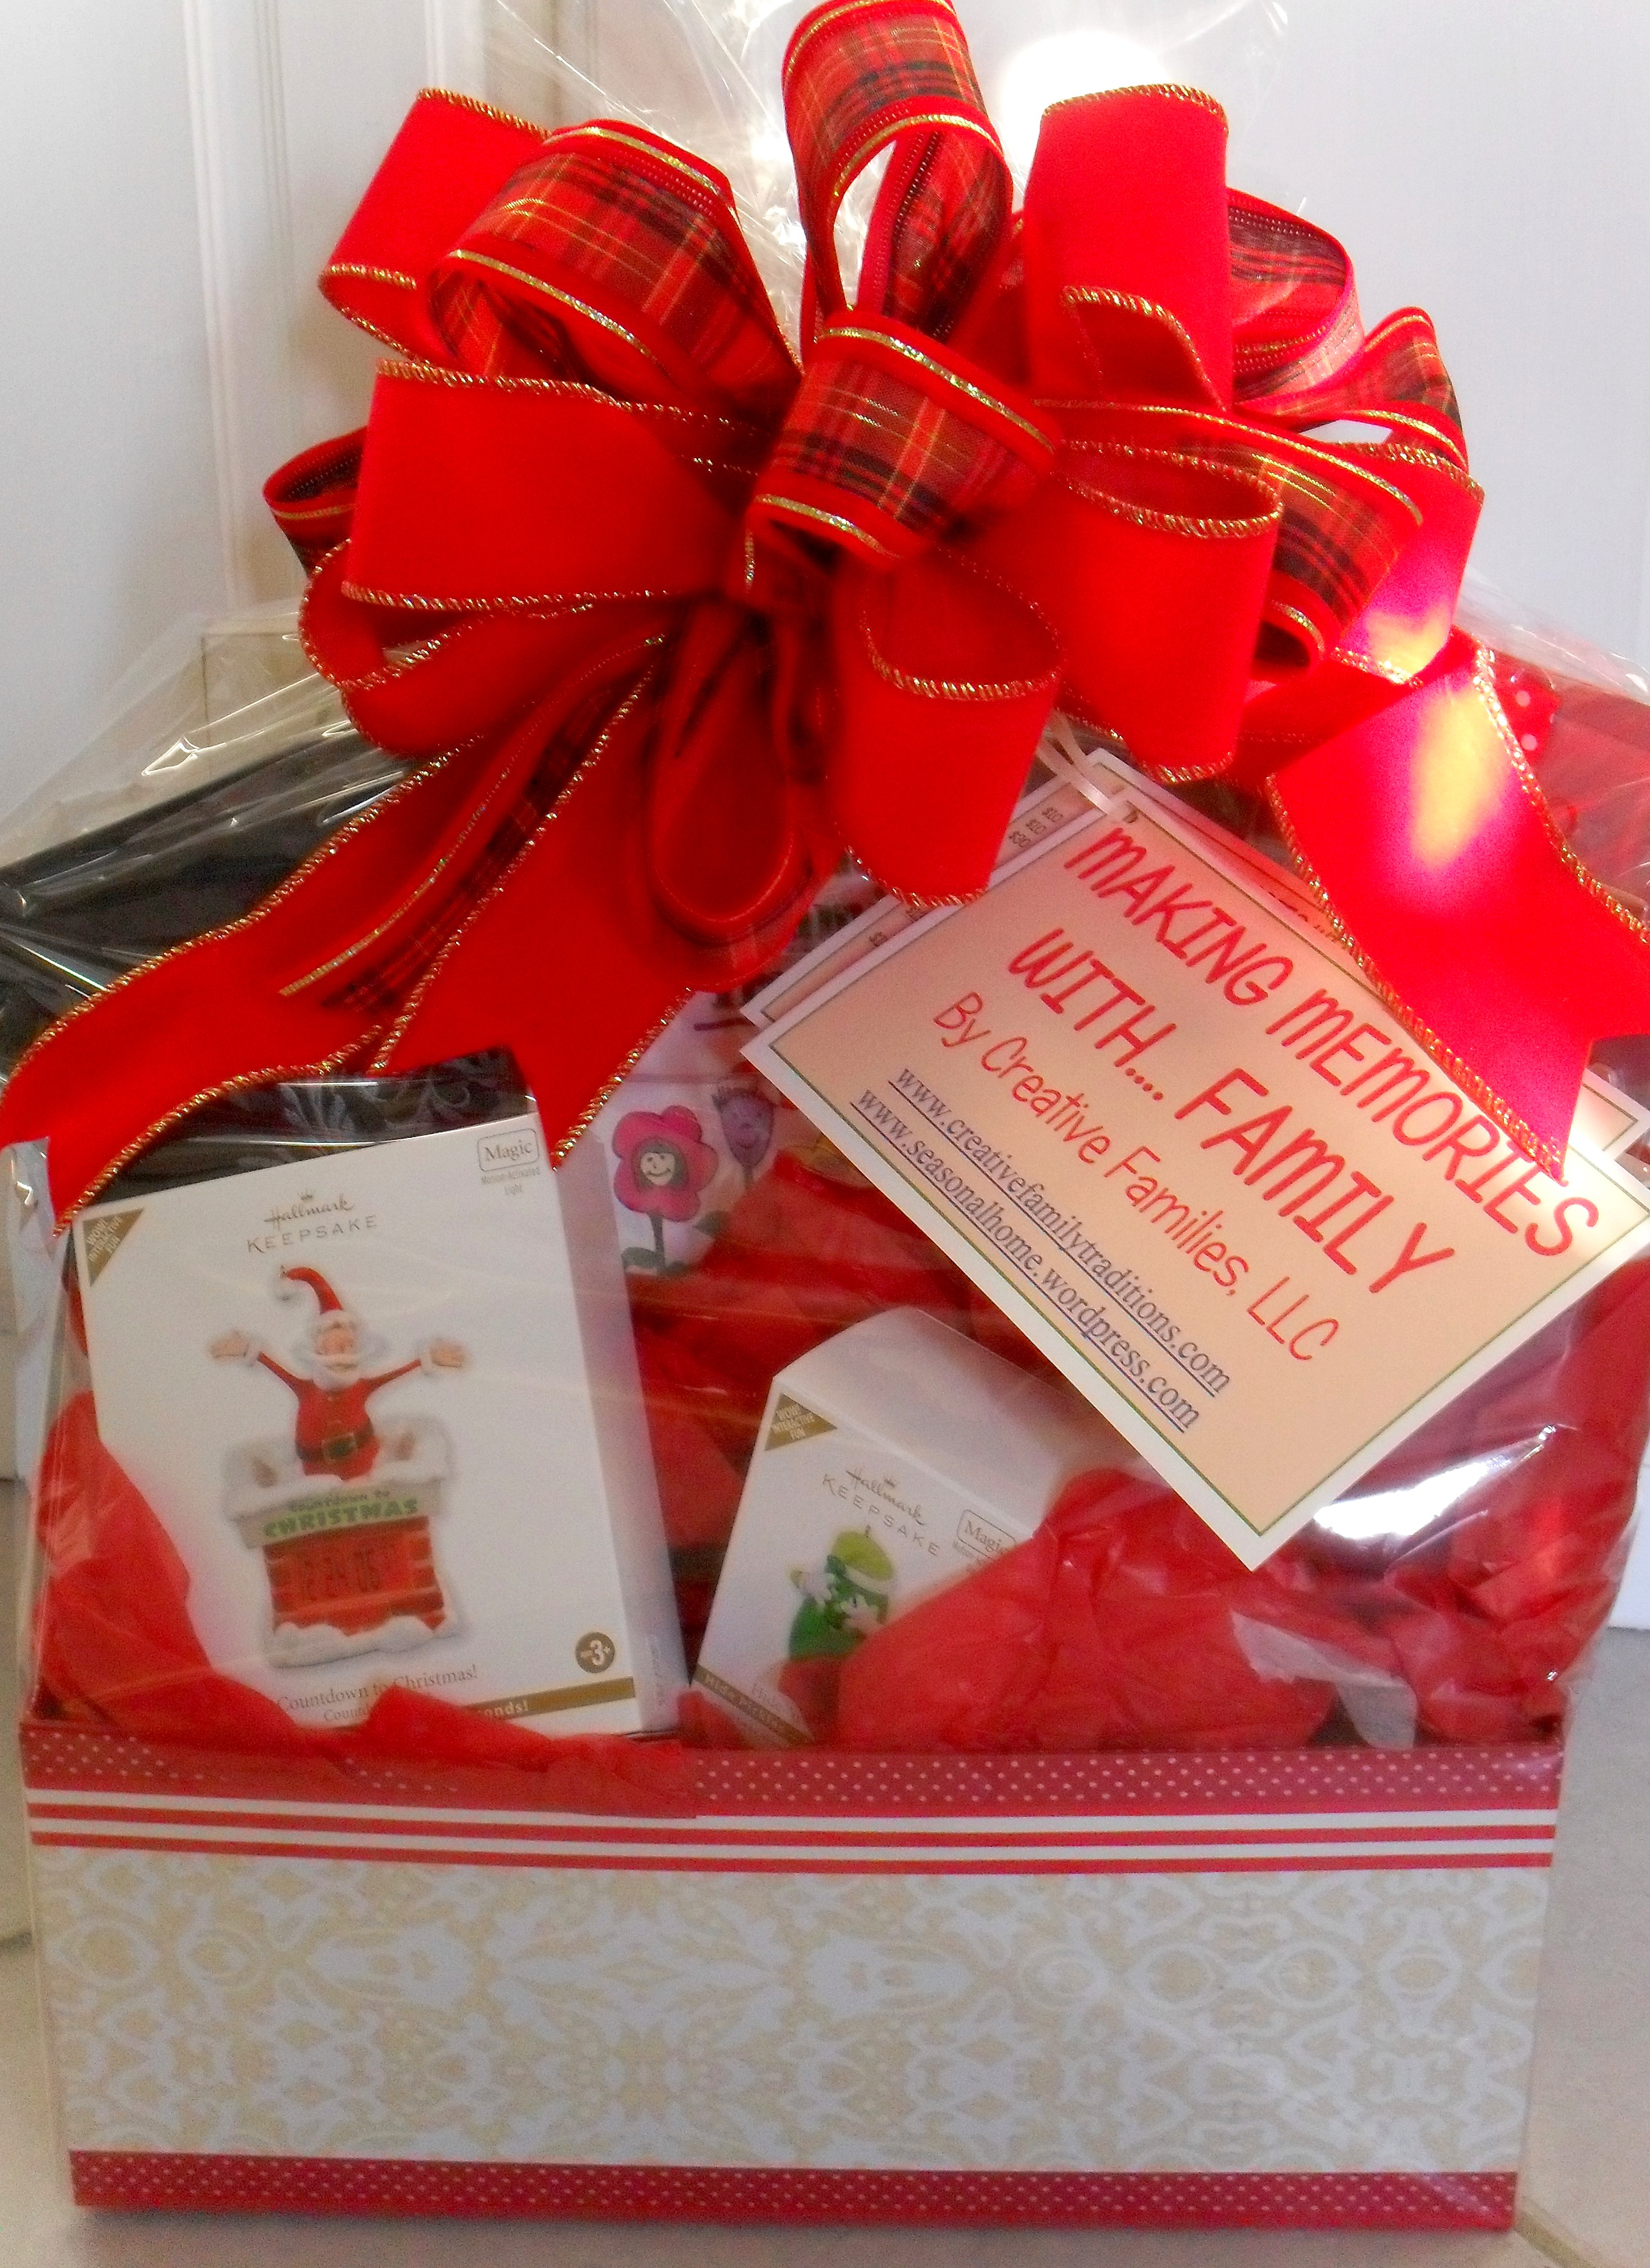 Gifting Family Memories 171 The Seasonal Home